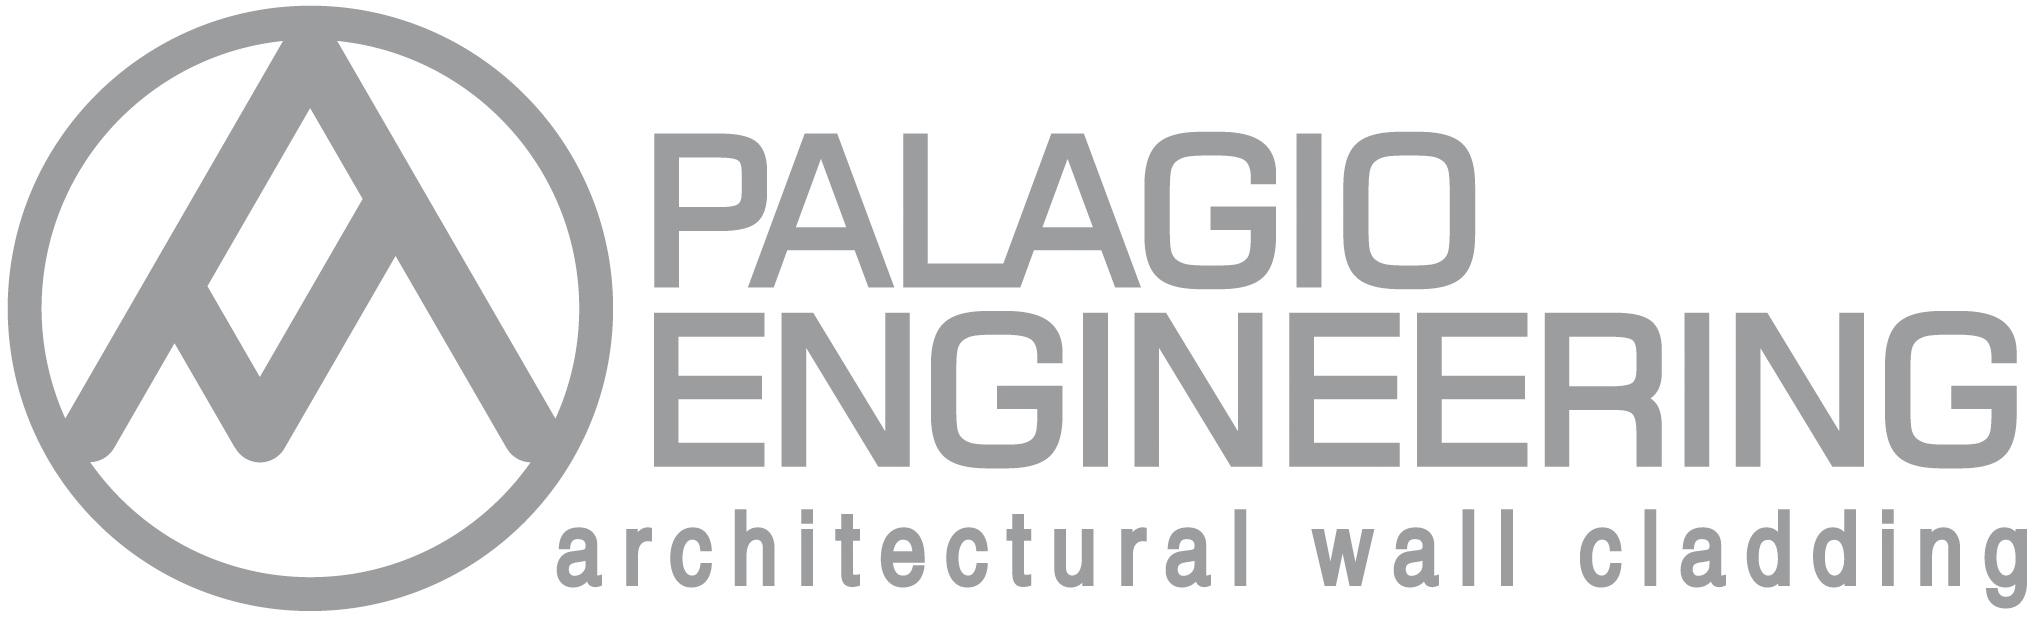 Palagio Engineering